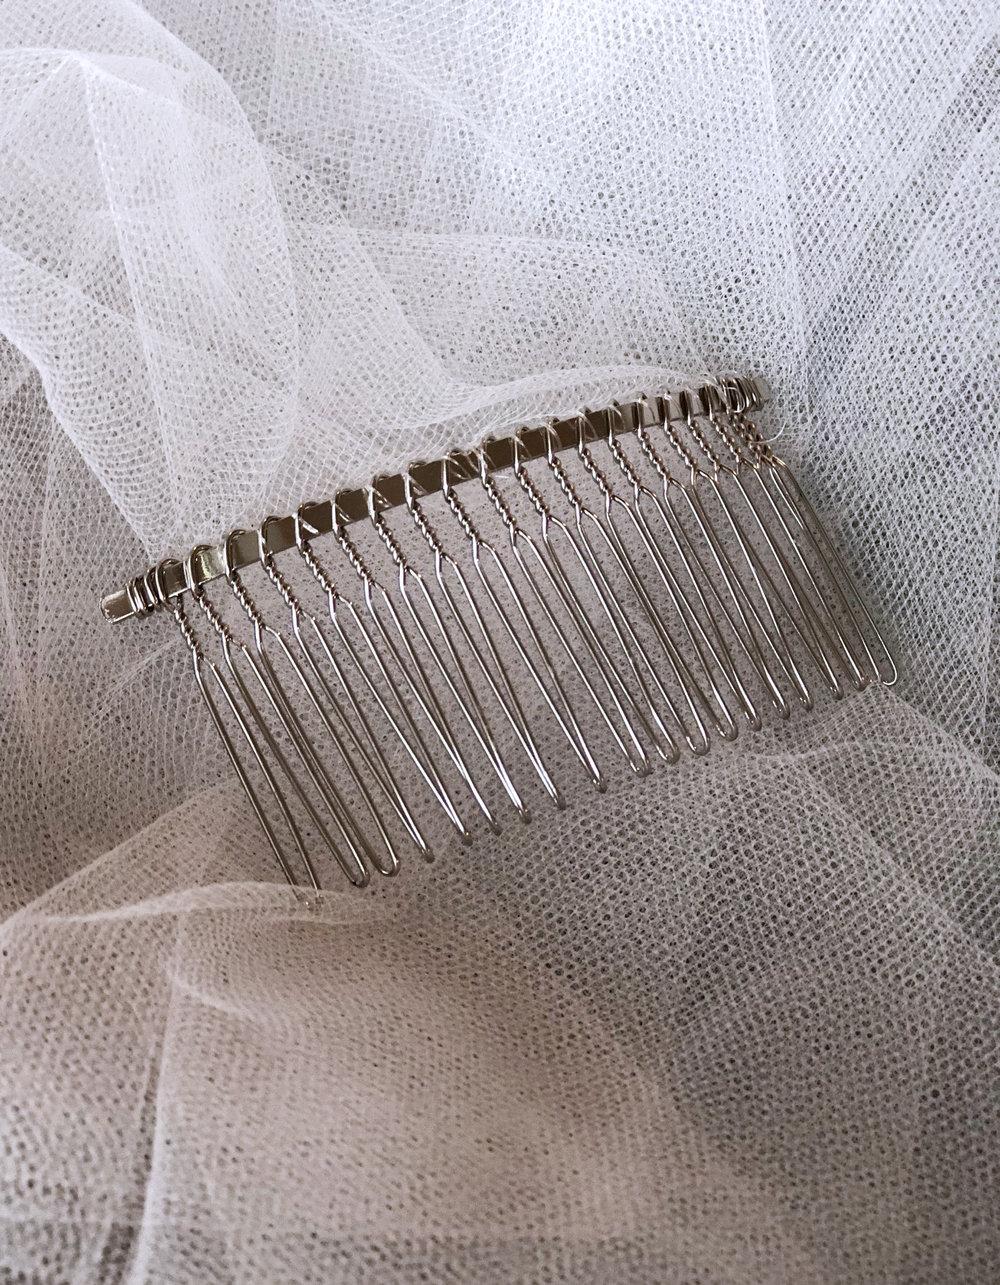 Comb blog feature.jpg